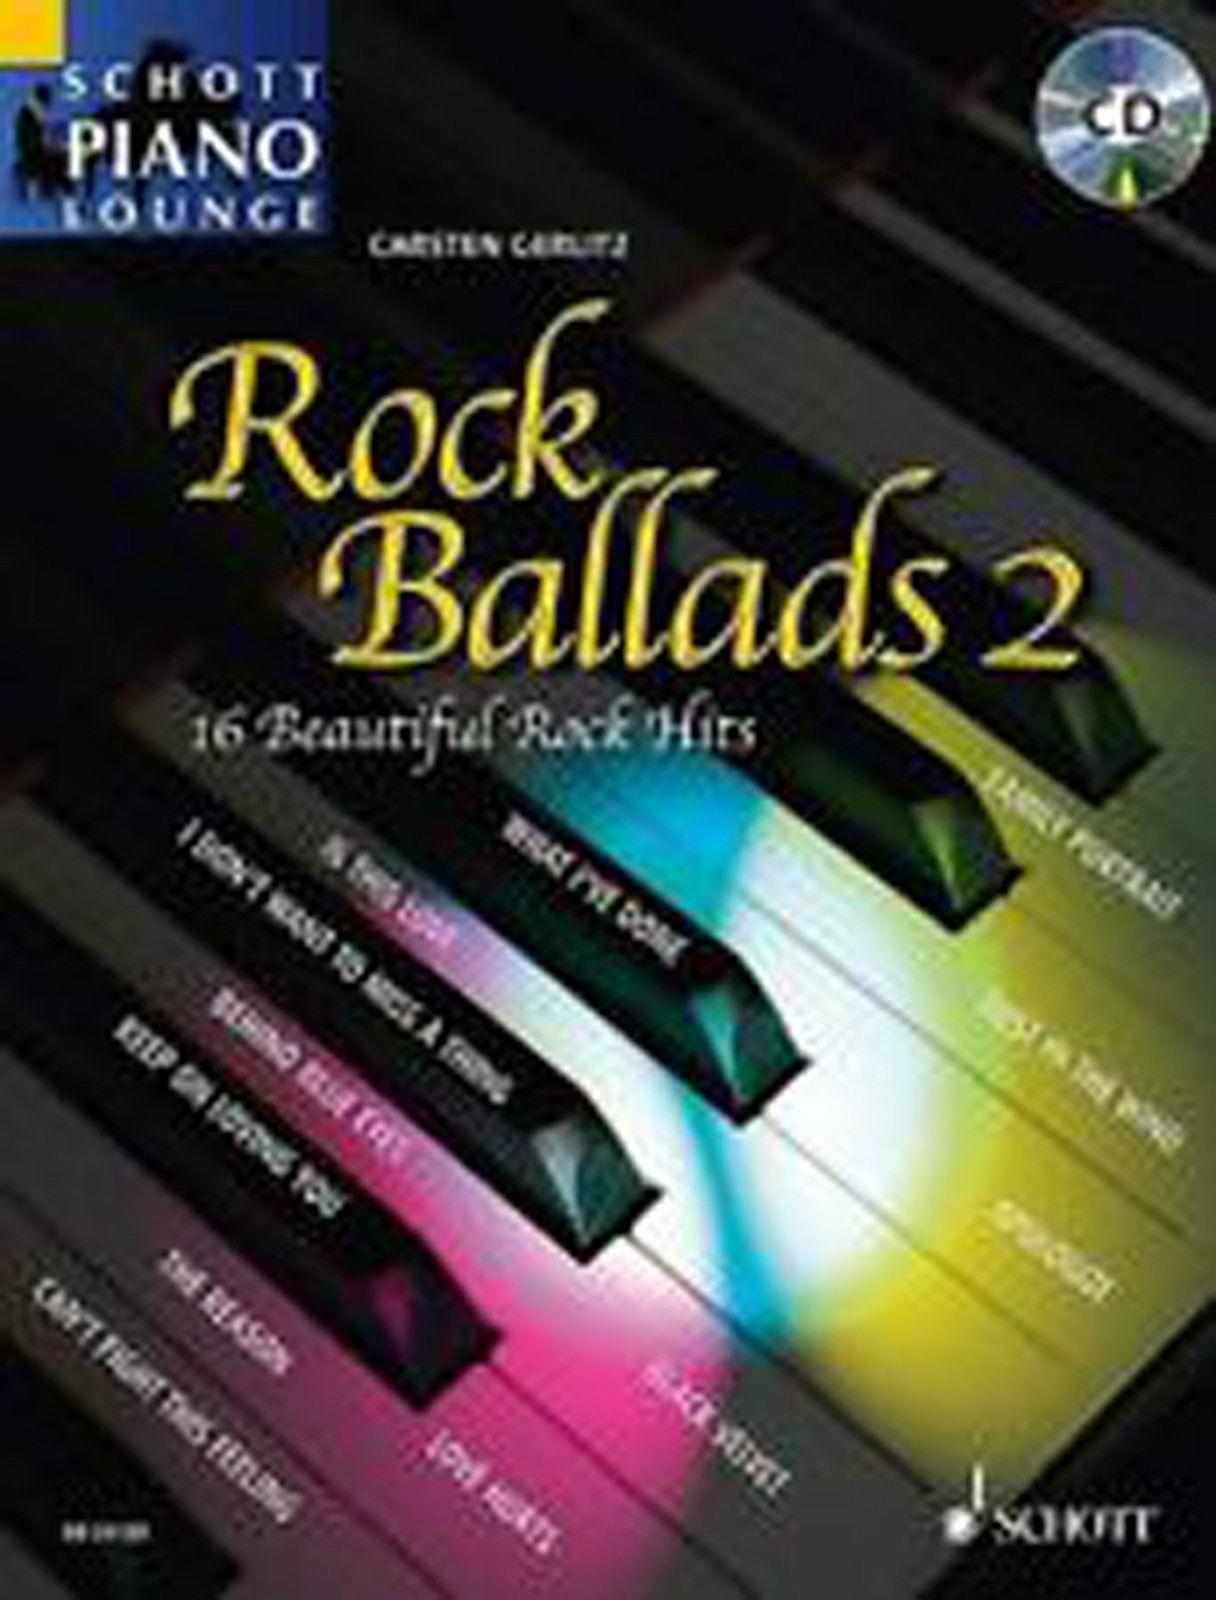 Rock Ballads 2 Schott Piano Lounge Sheet Music Songbook CD Grade 5+ Gerlitz B51